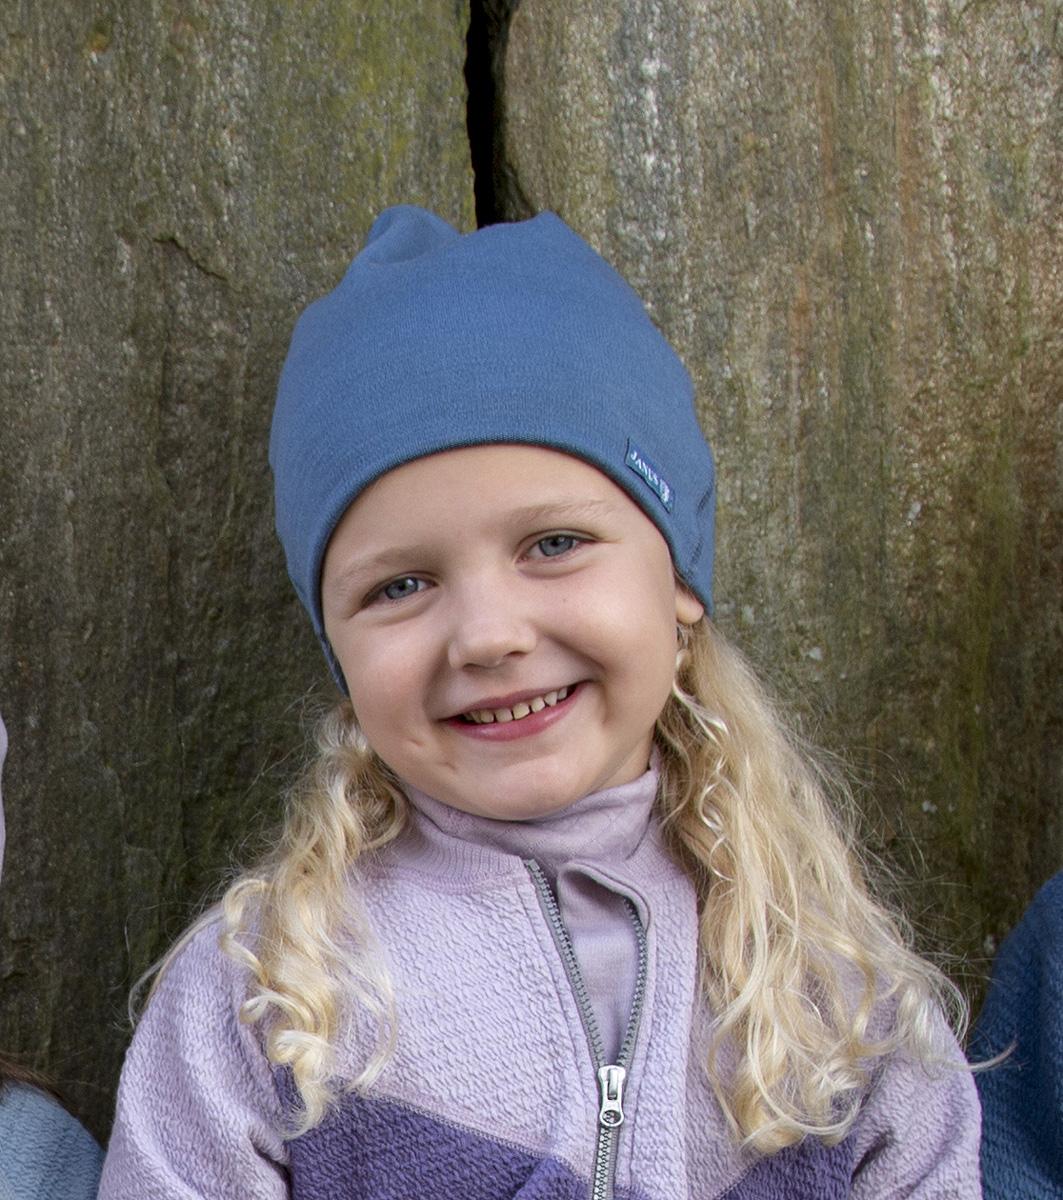 Janus beaniemössa barn blå 100% merinoull